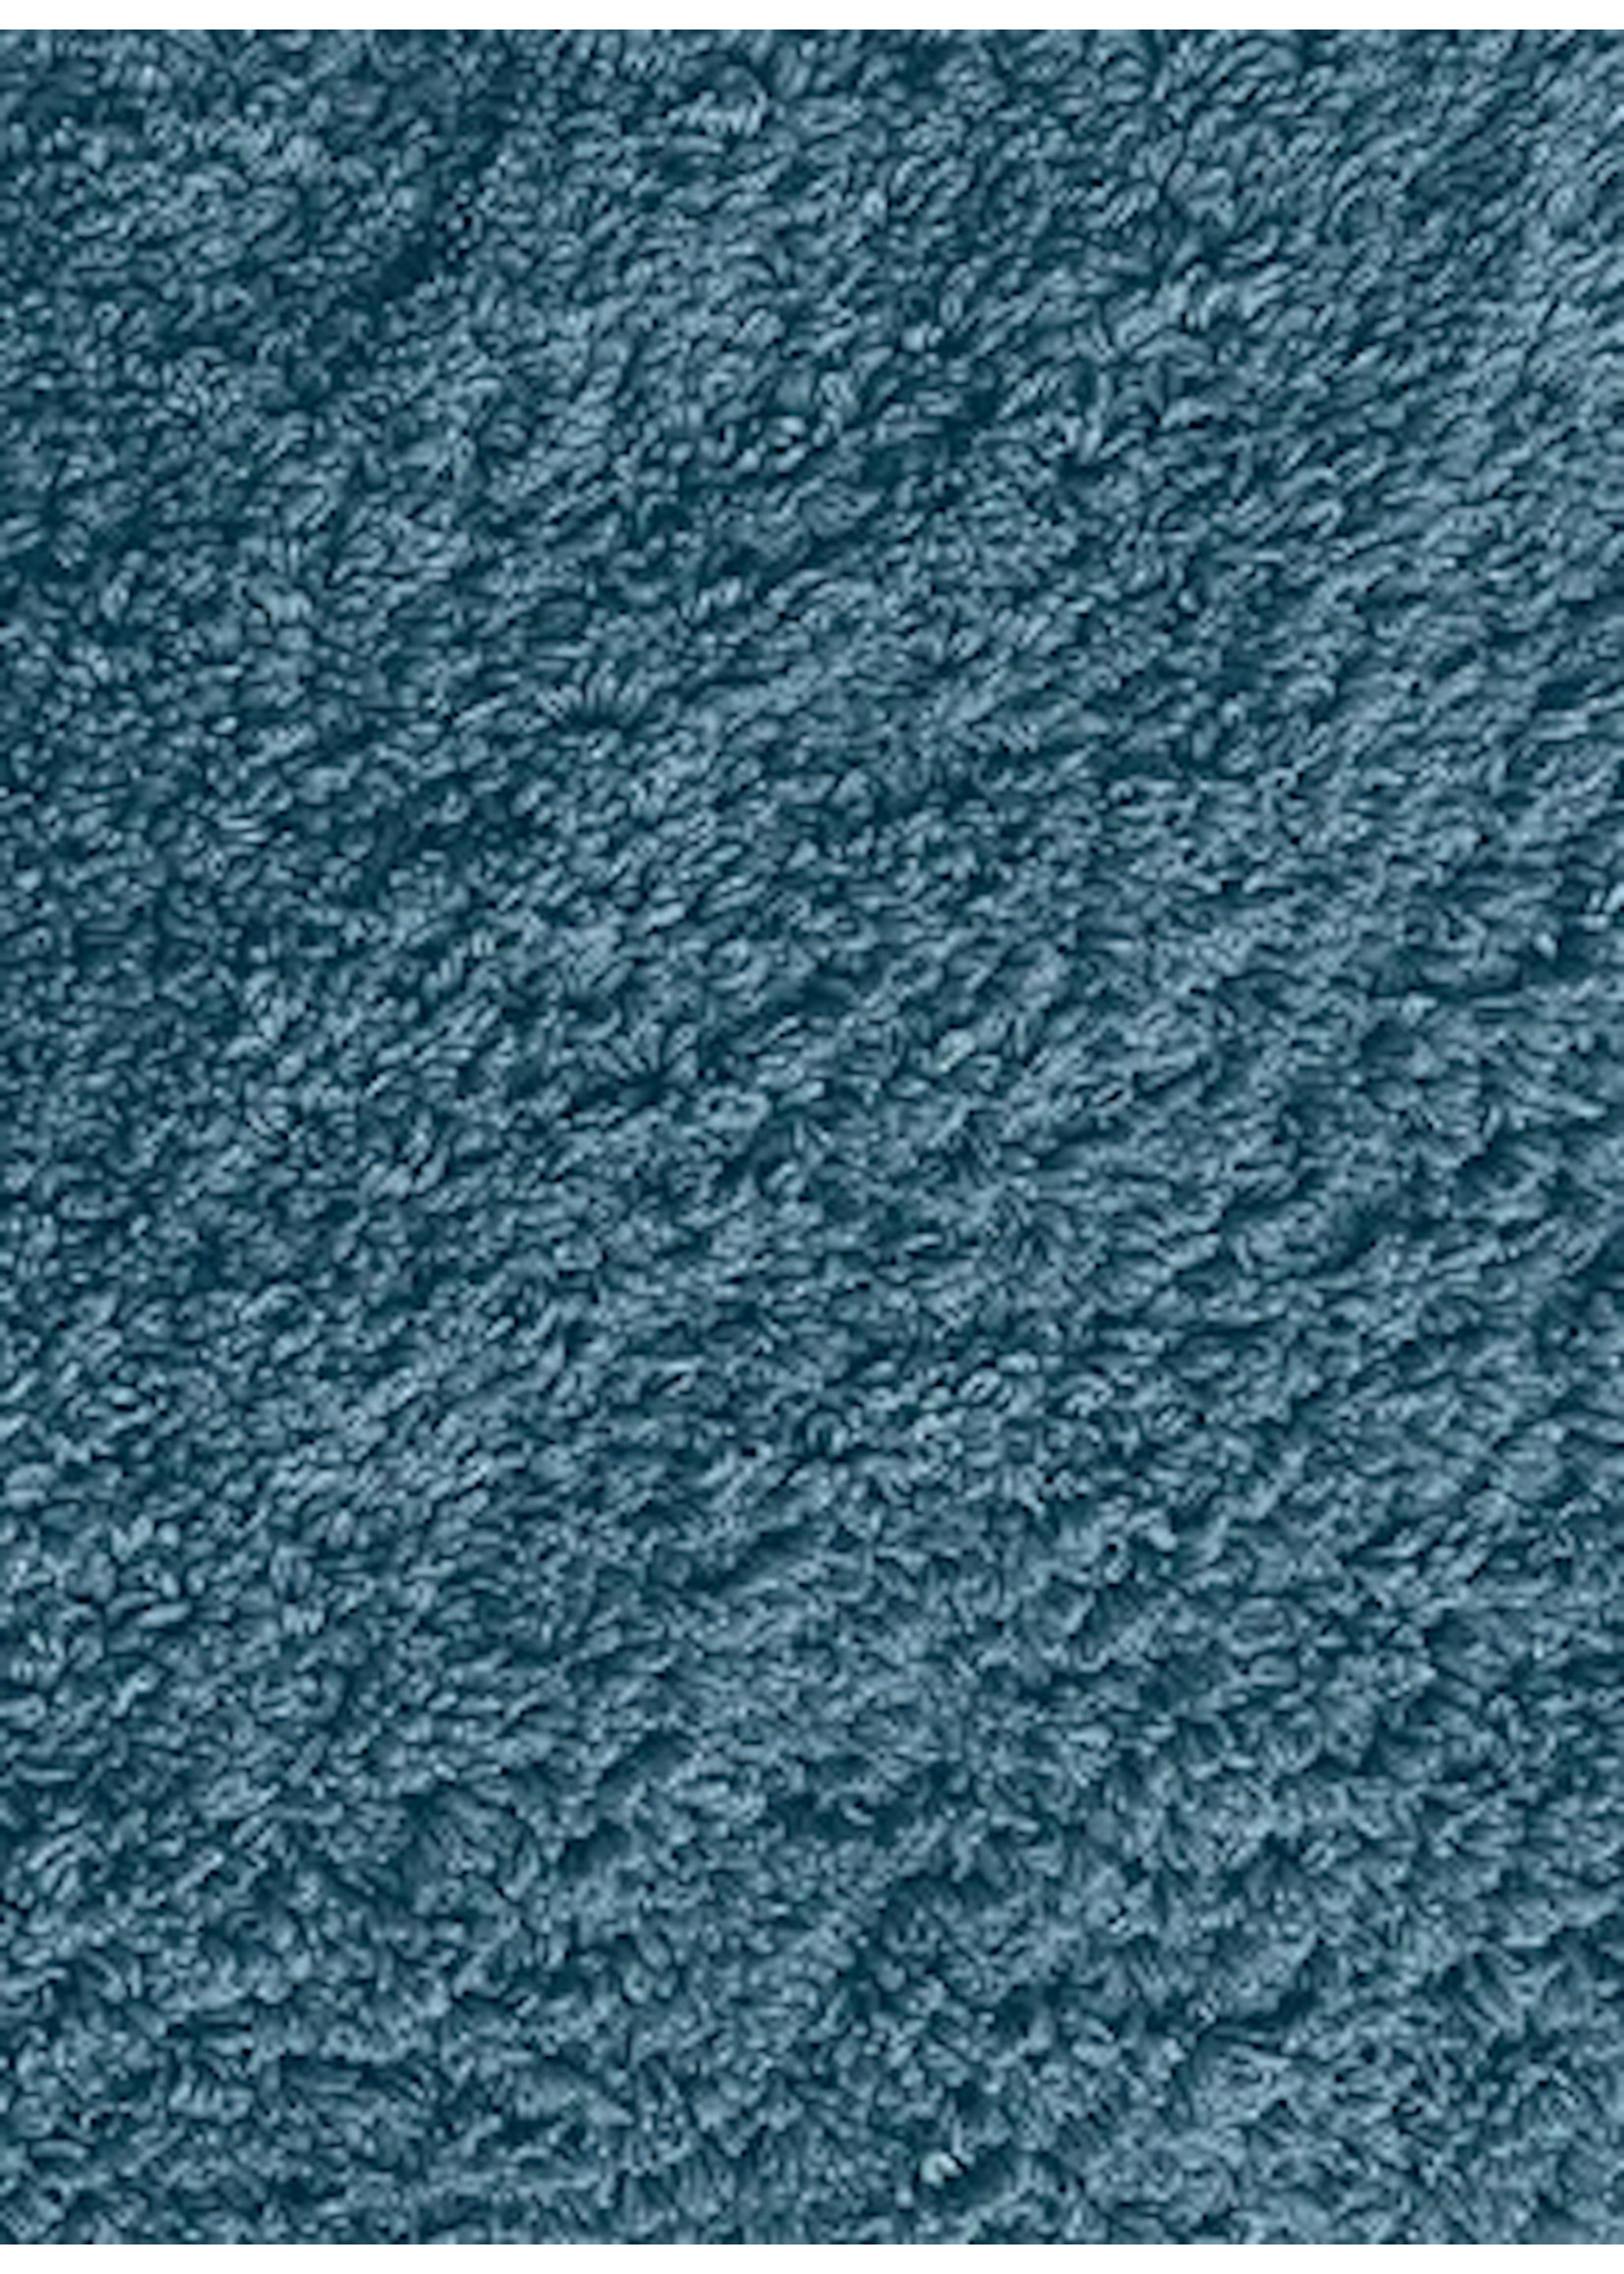 Abyss & Habidecor Super Pile Atlantic Towels